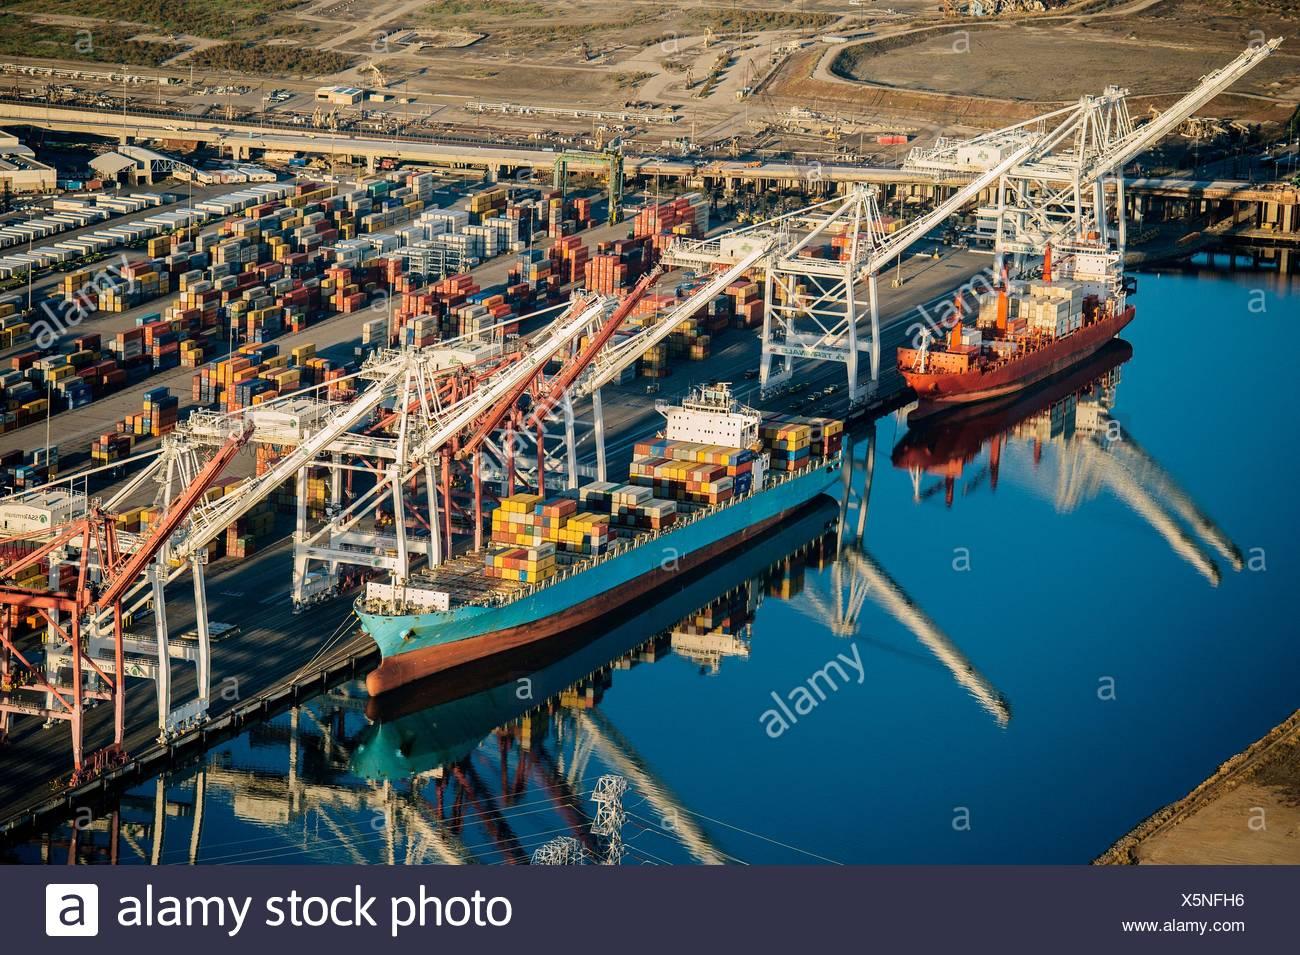 Shipping port, Los Angeles, California, USA - Stock Image